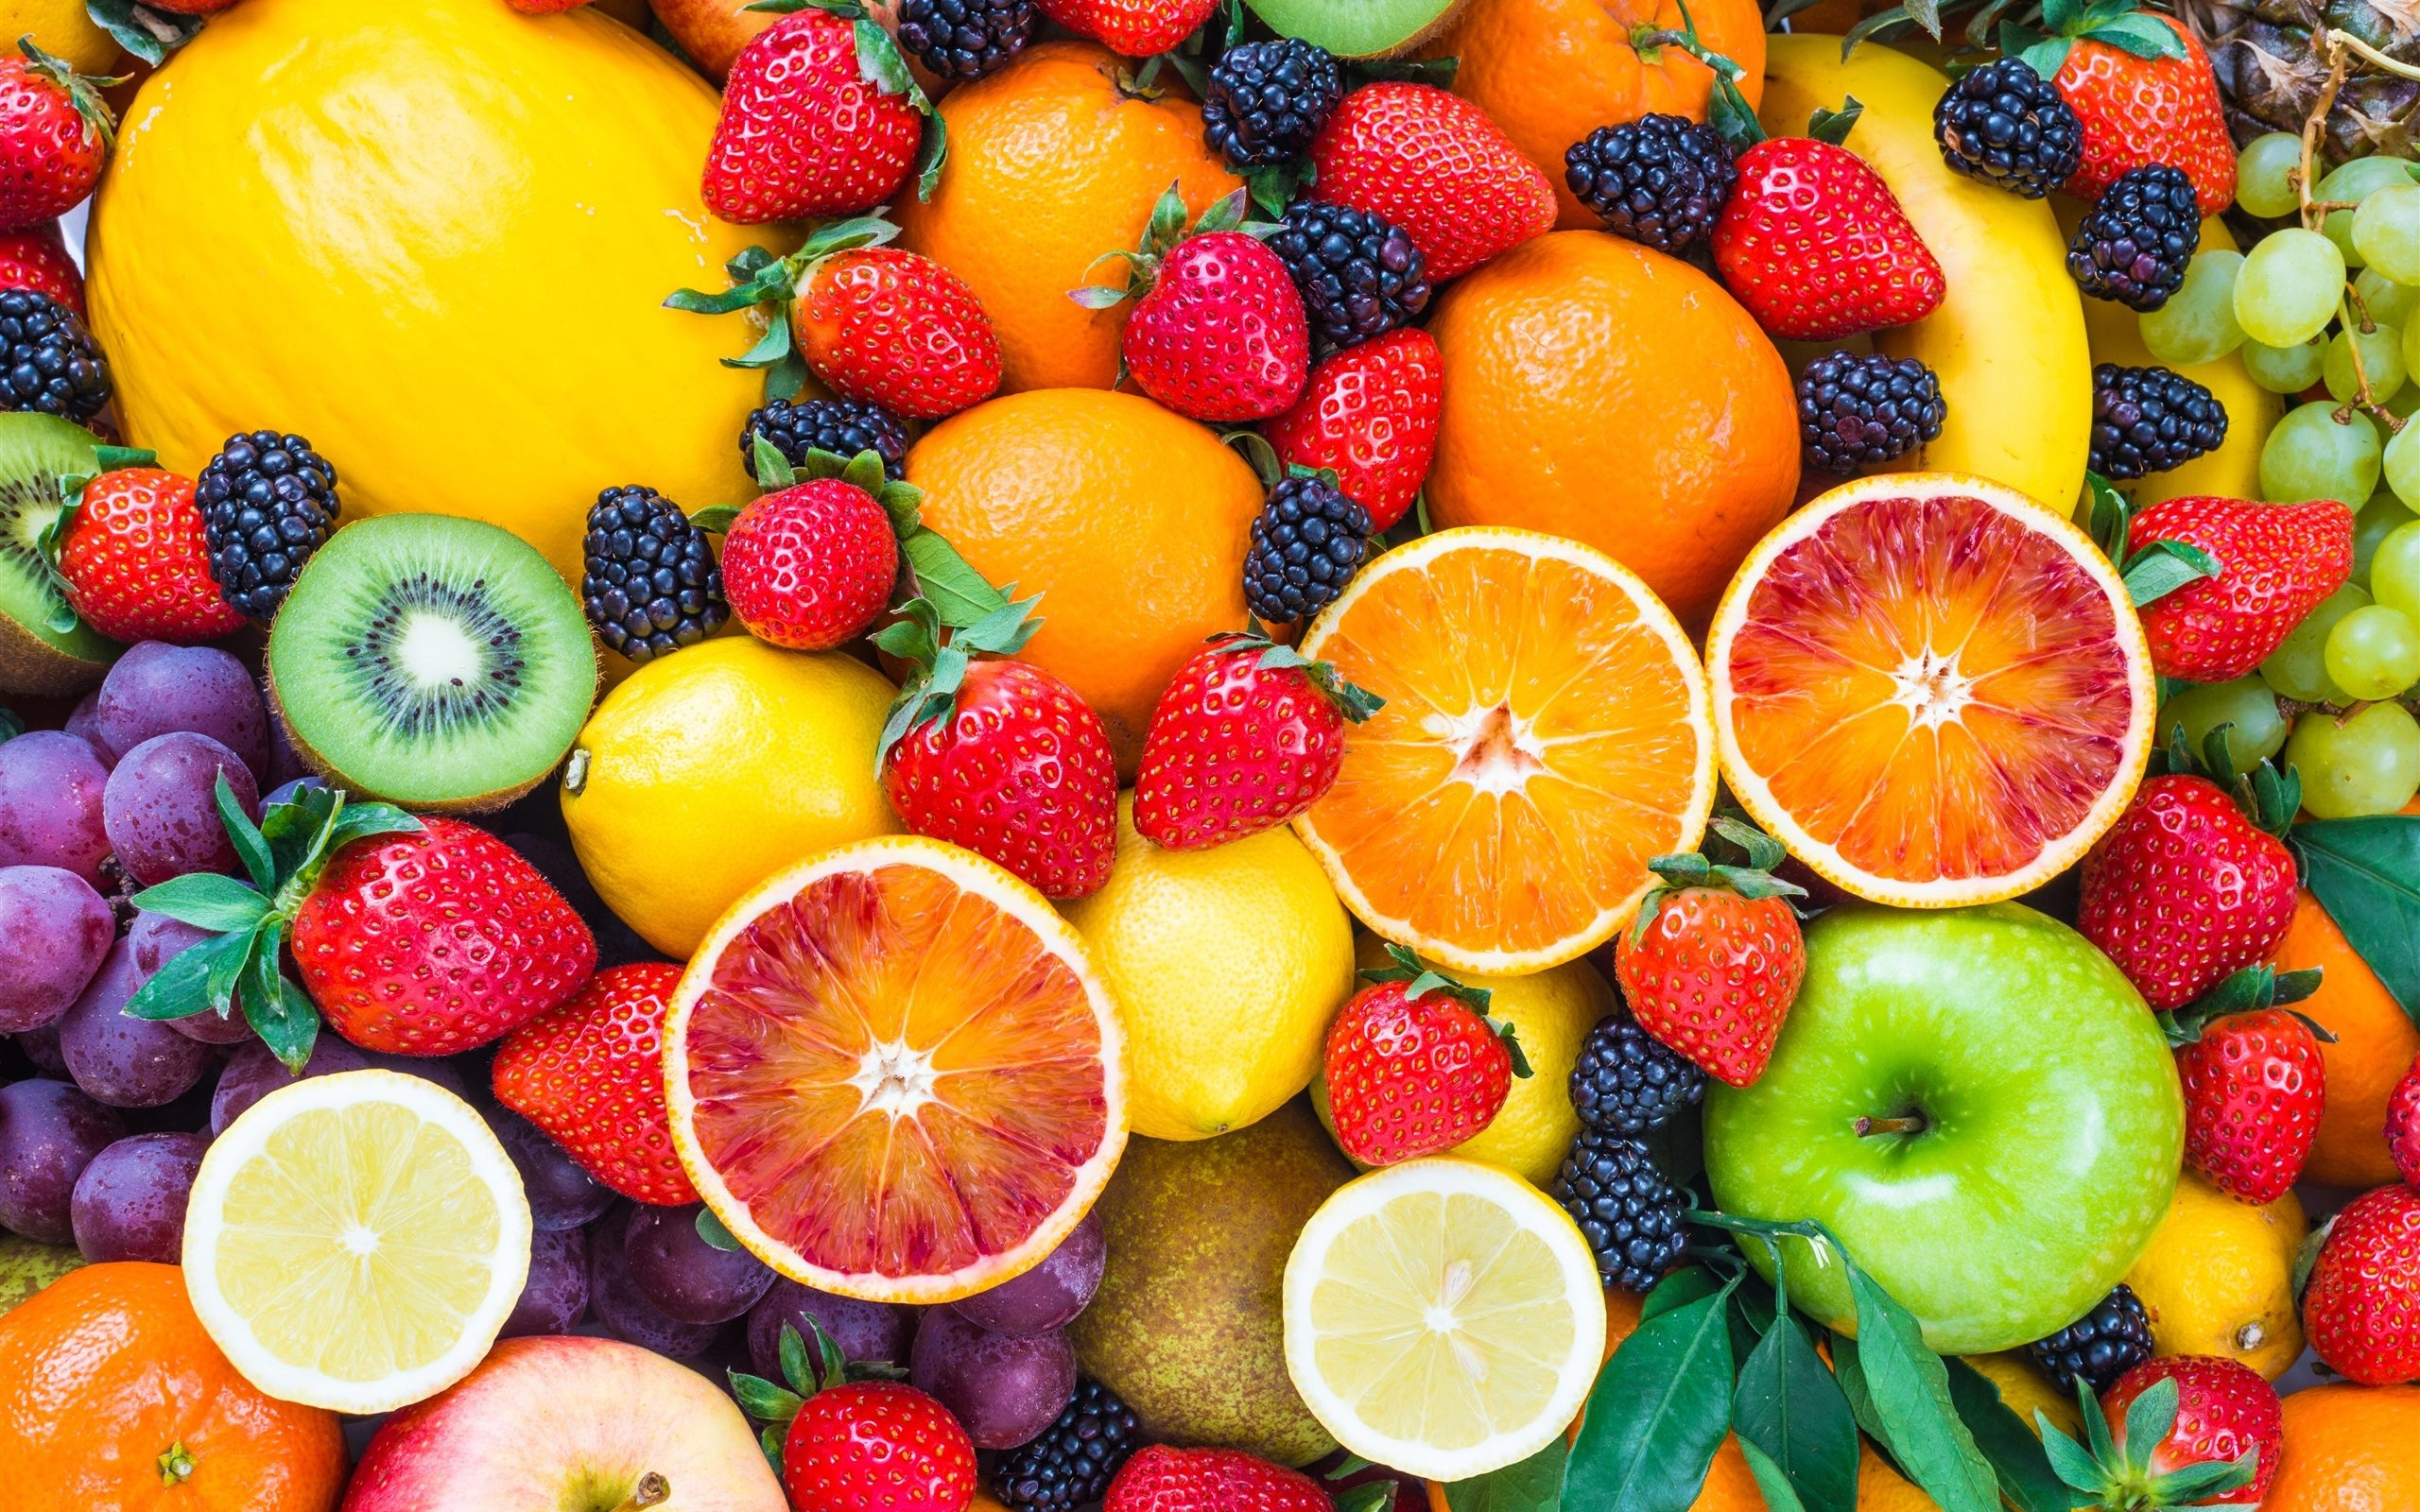 Red Raspberries Wallpaper Fruit 2020 Live Wallpaper HD 2560x1600